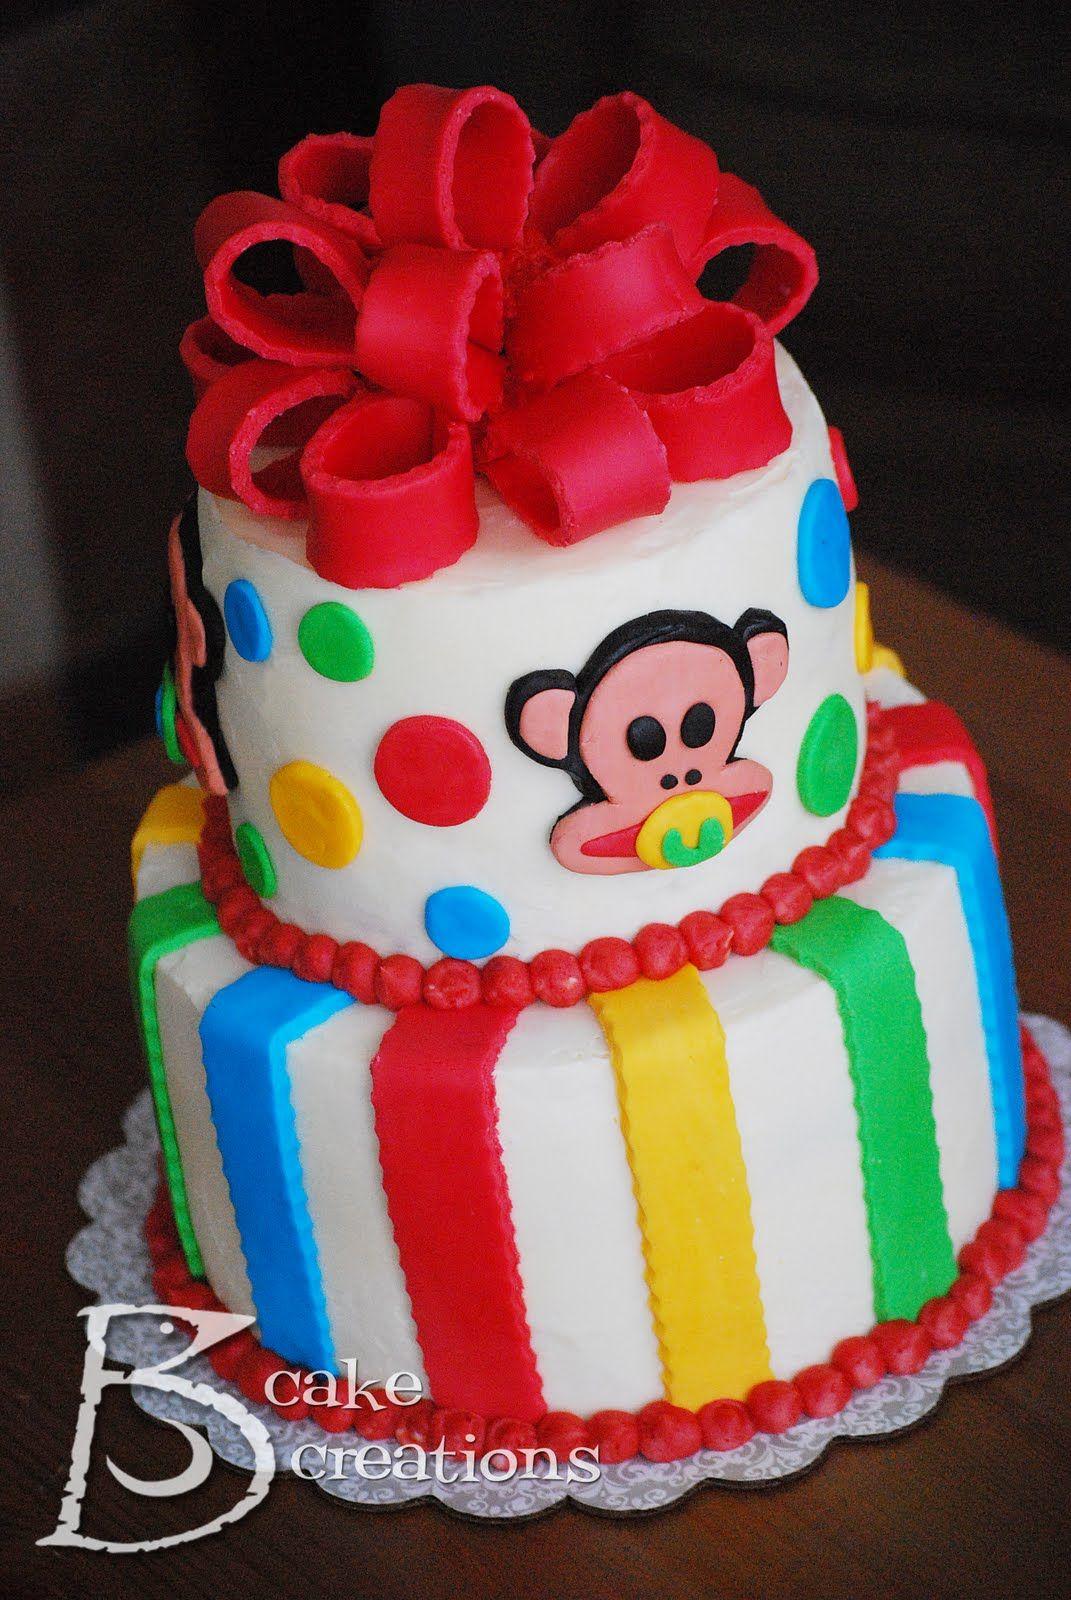 Jaybird Creations: Cake Decorating - Paul Frank Monkey Baby Shower Cake & Cookies